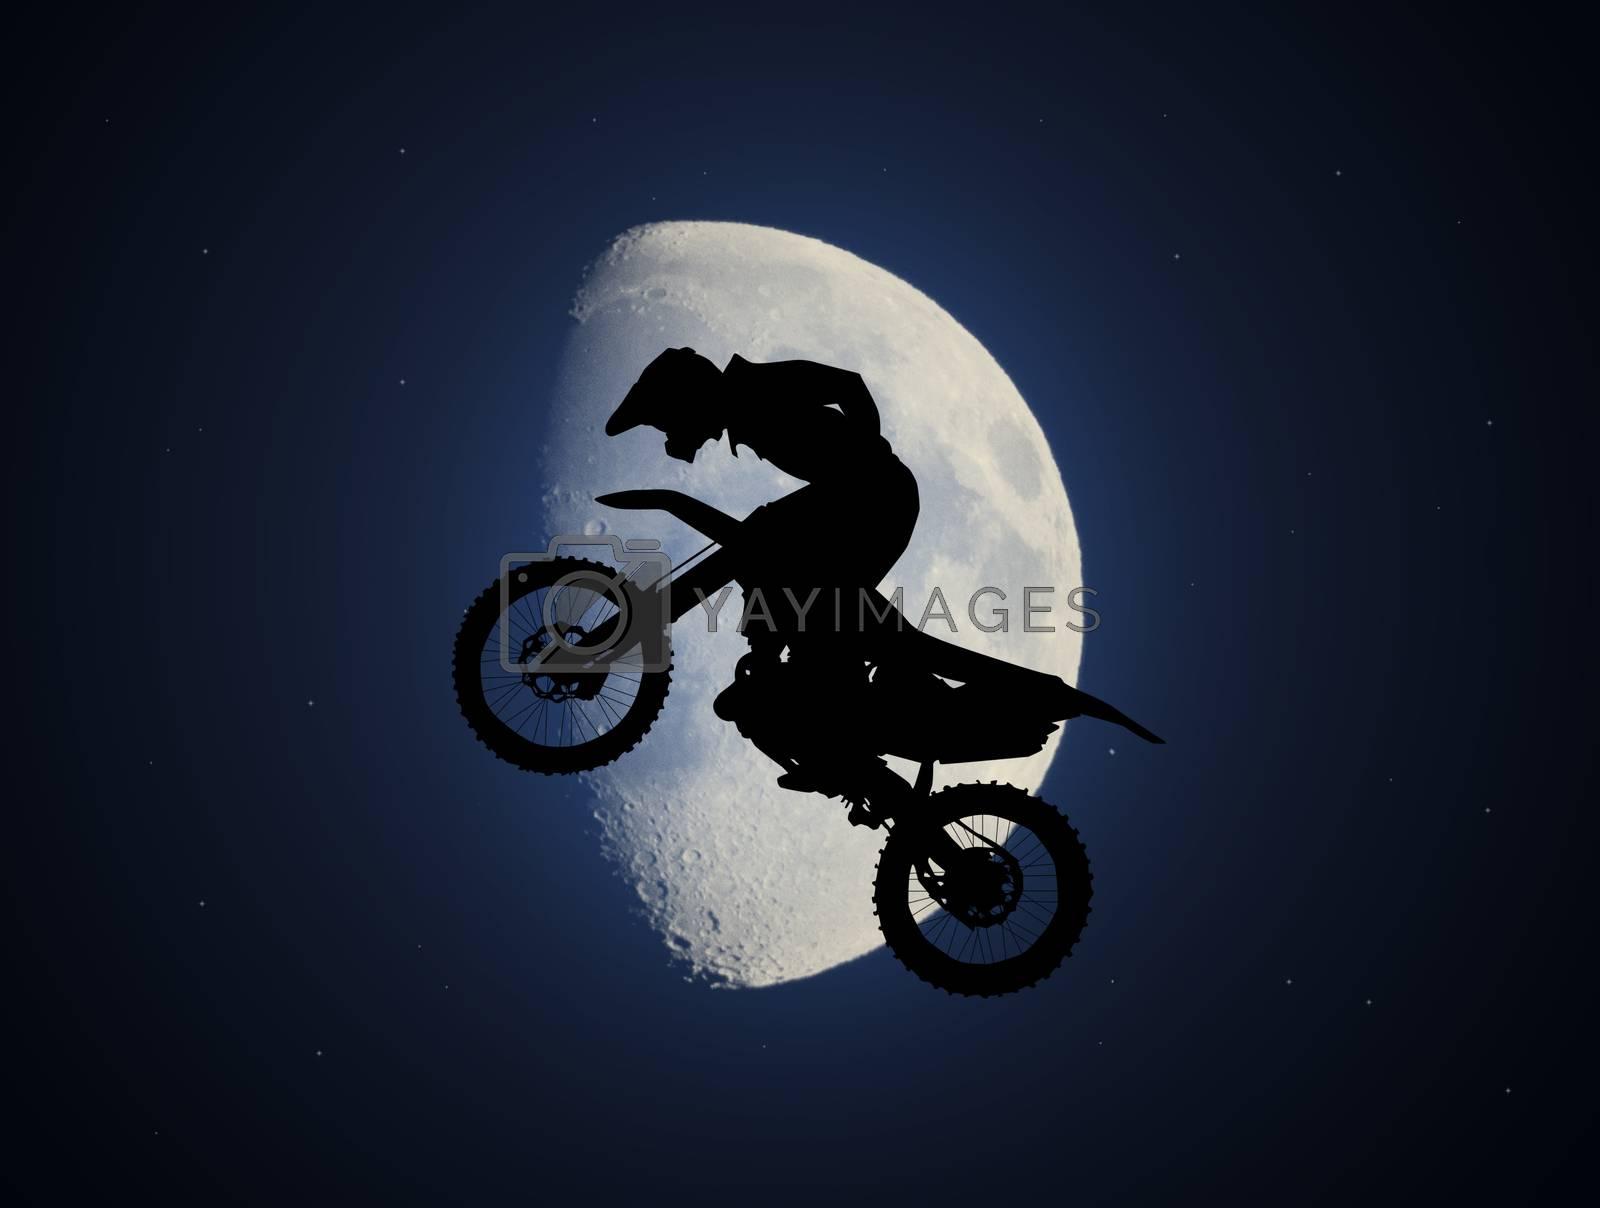 illustration of freestyle motorcross in the moonlight